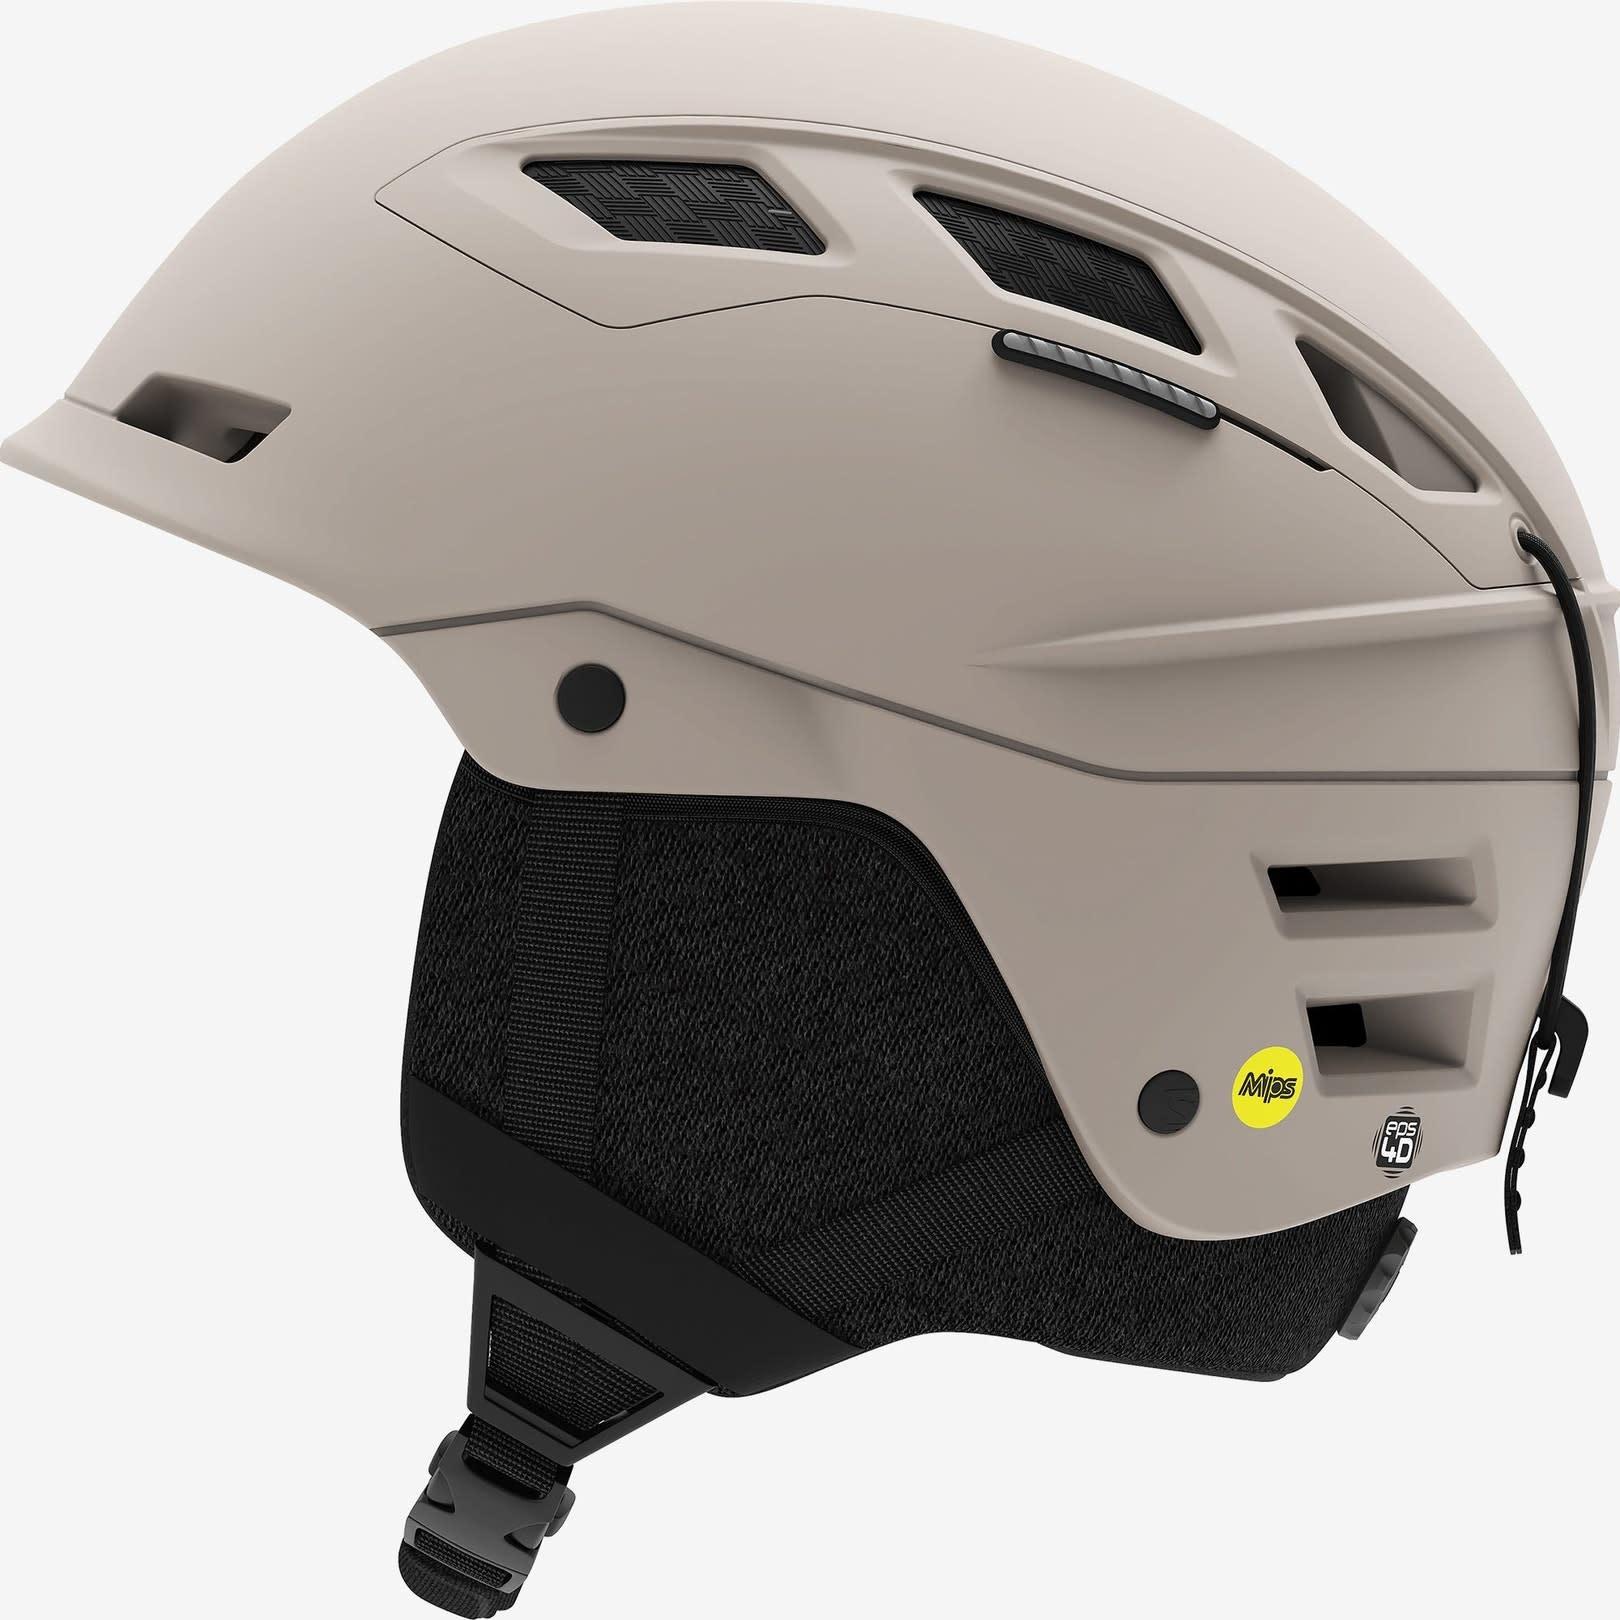 Salomon Salomon QST Charge MIPS Helmet